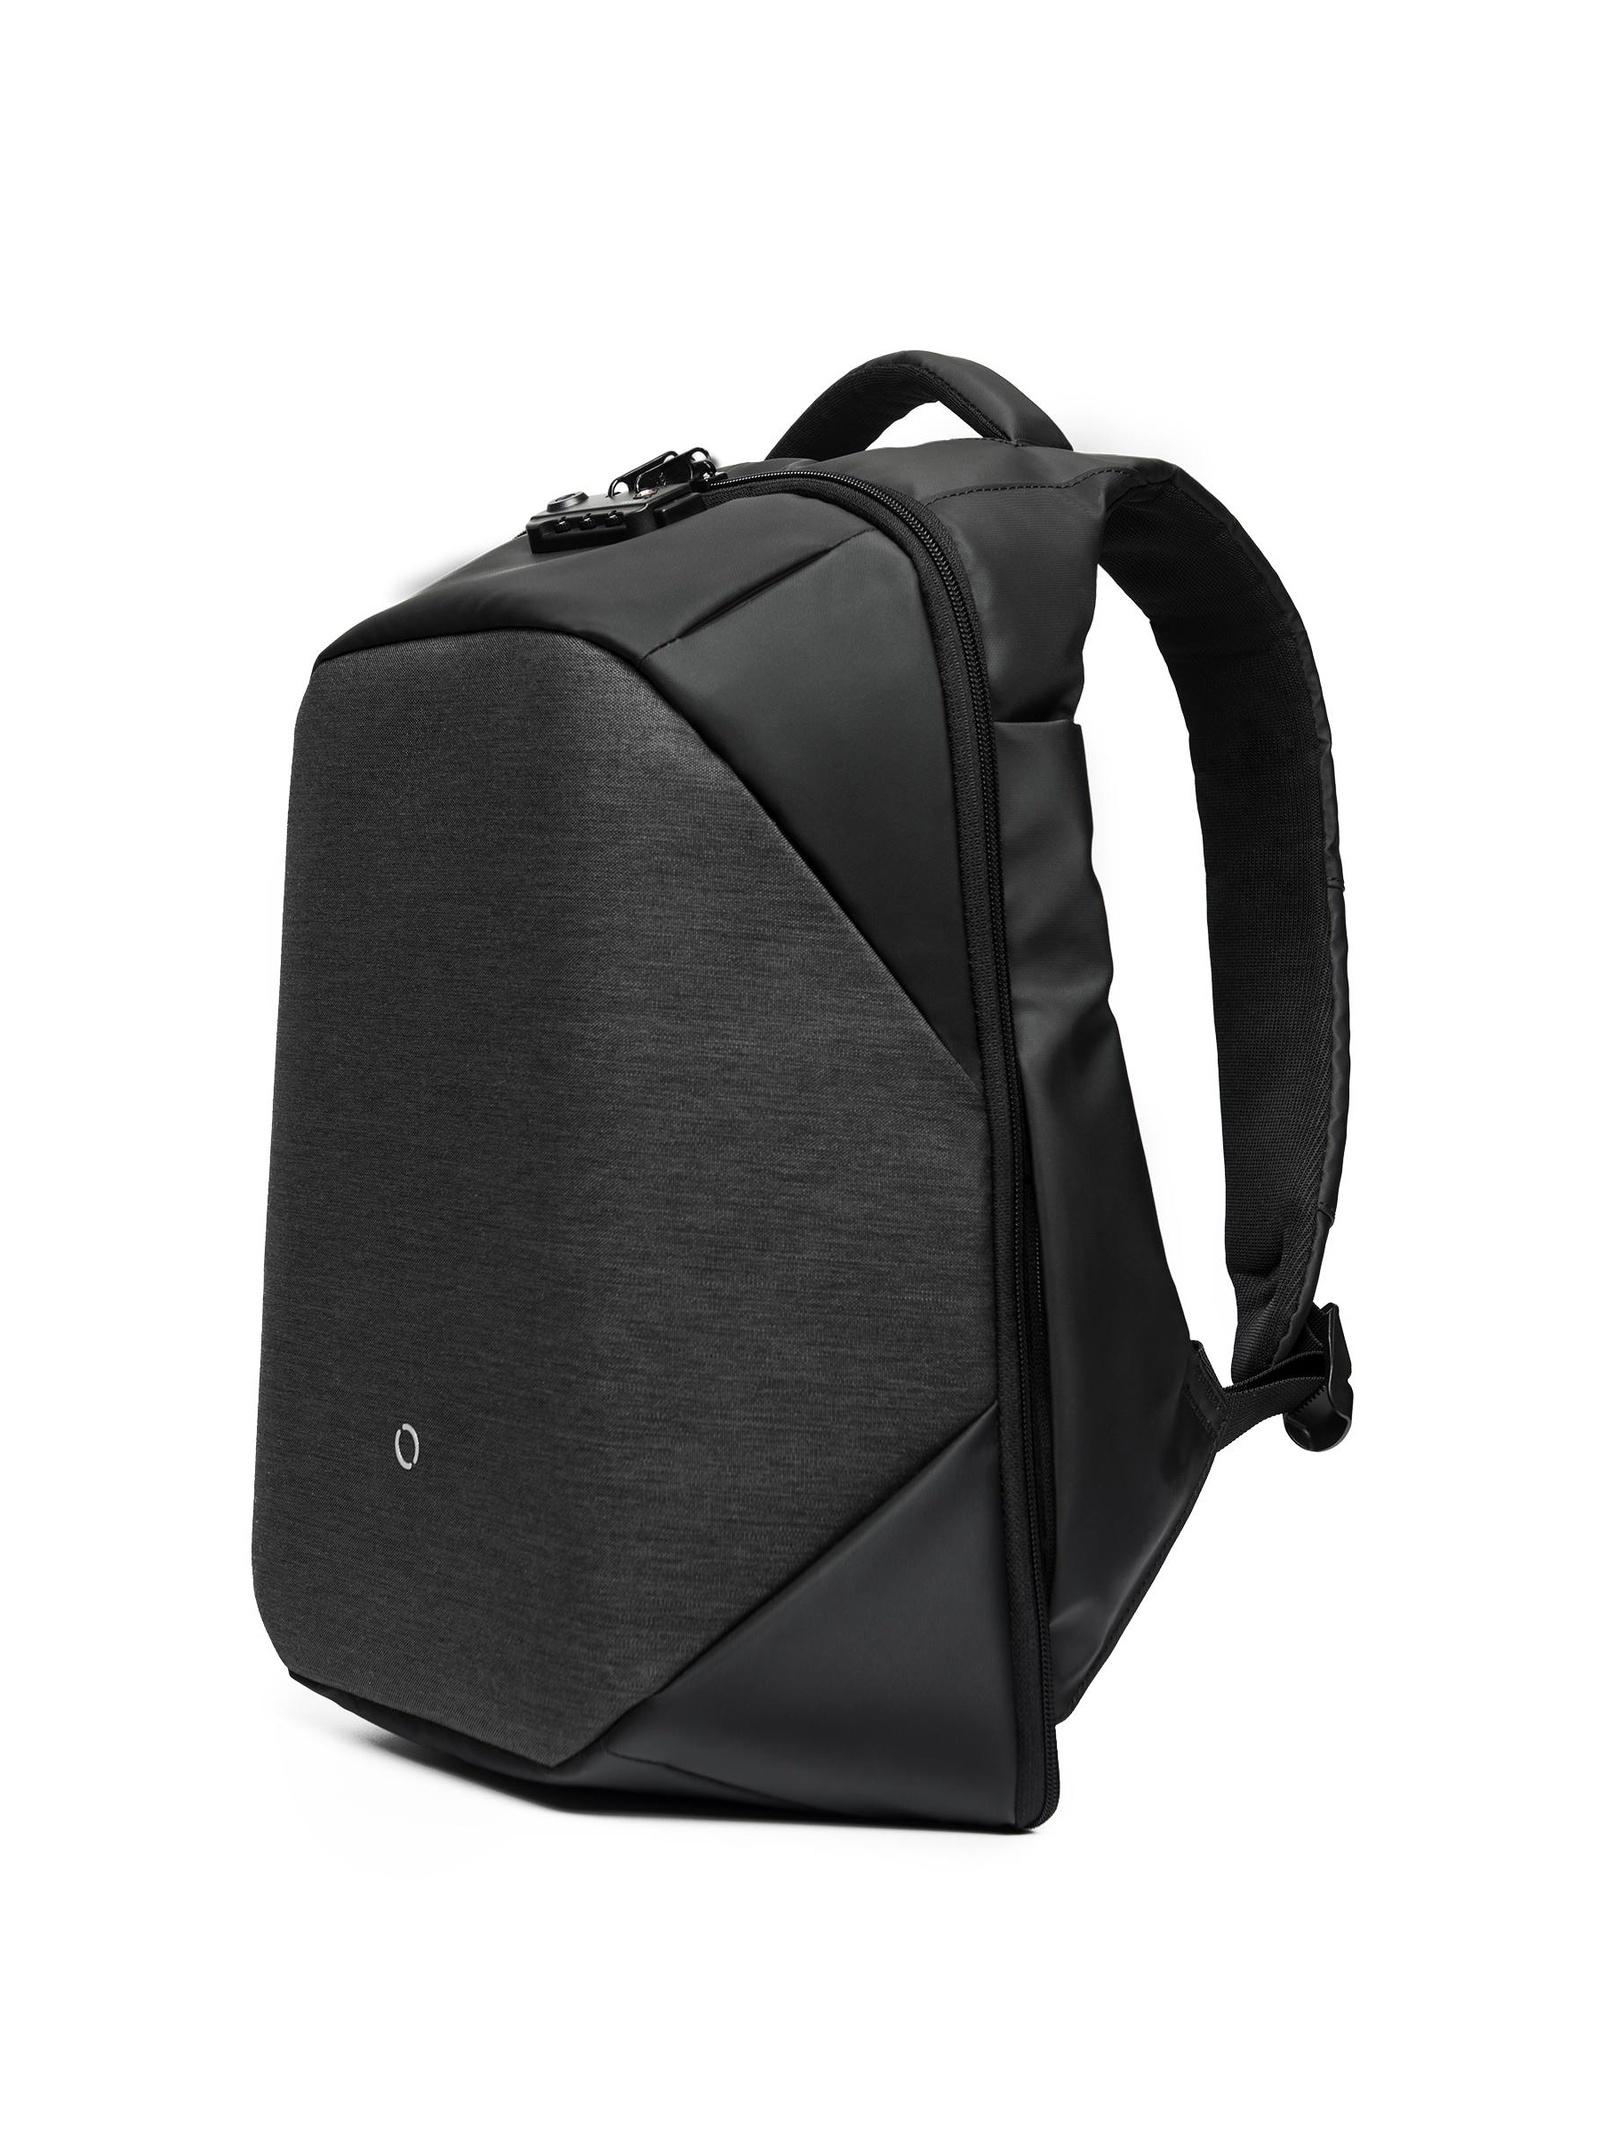 Рюкзак KORIN ClickPack Basic, черный рюкзак korin design clickpack gray серый